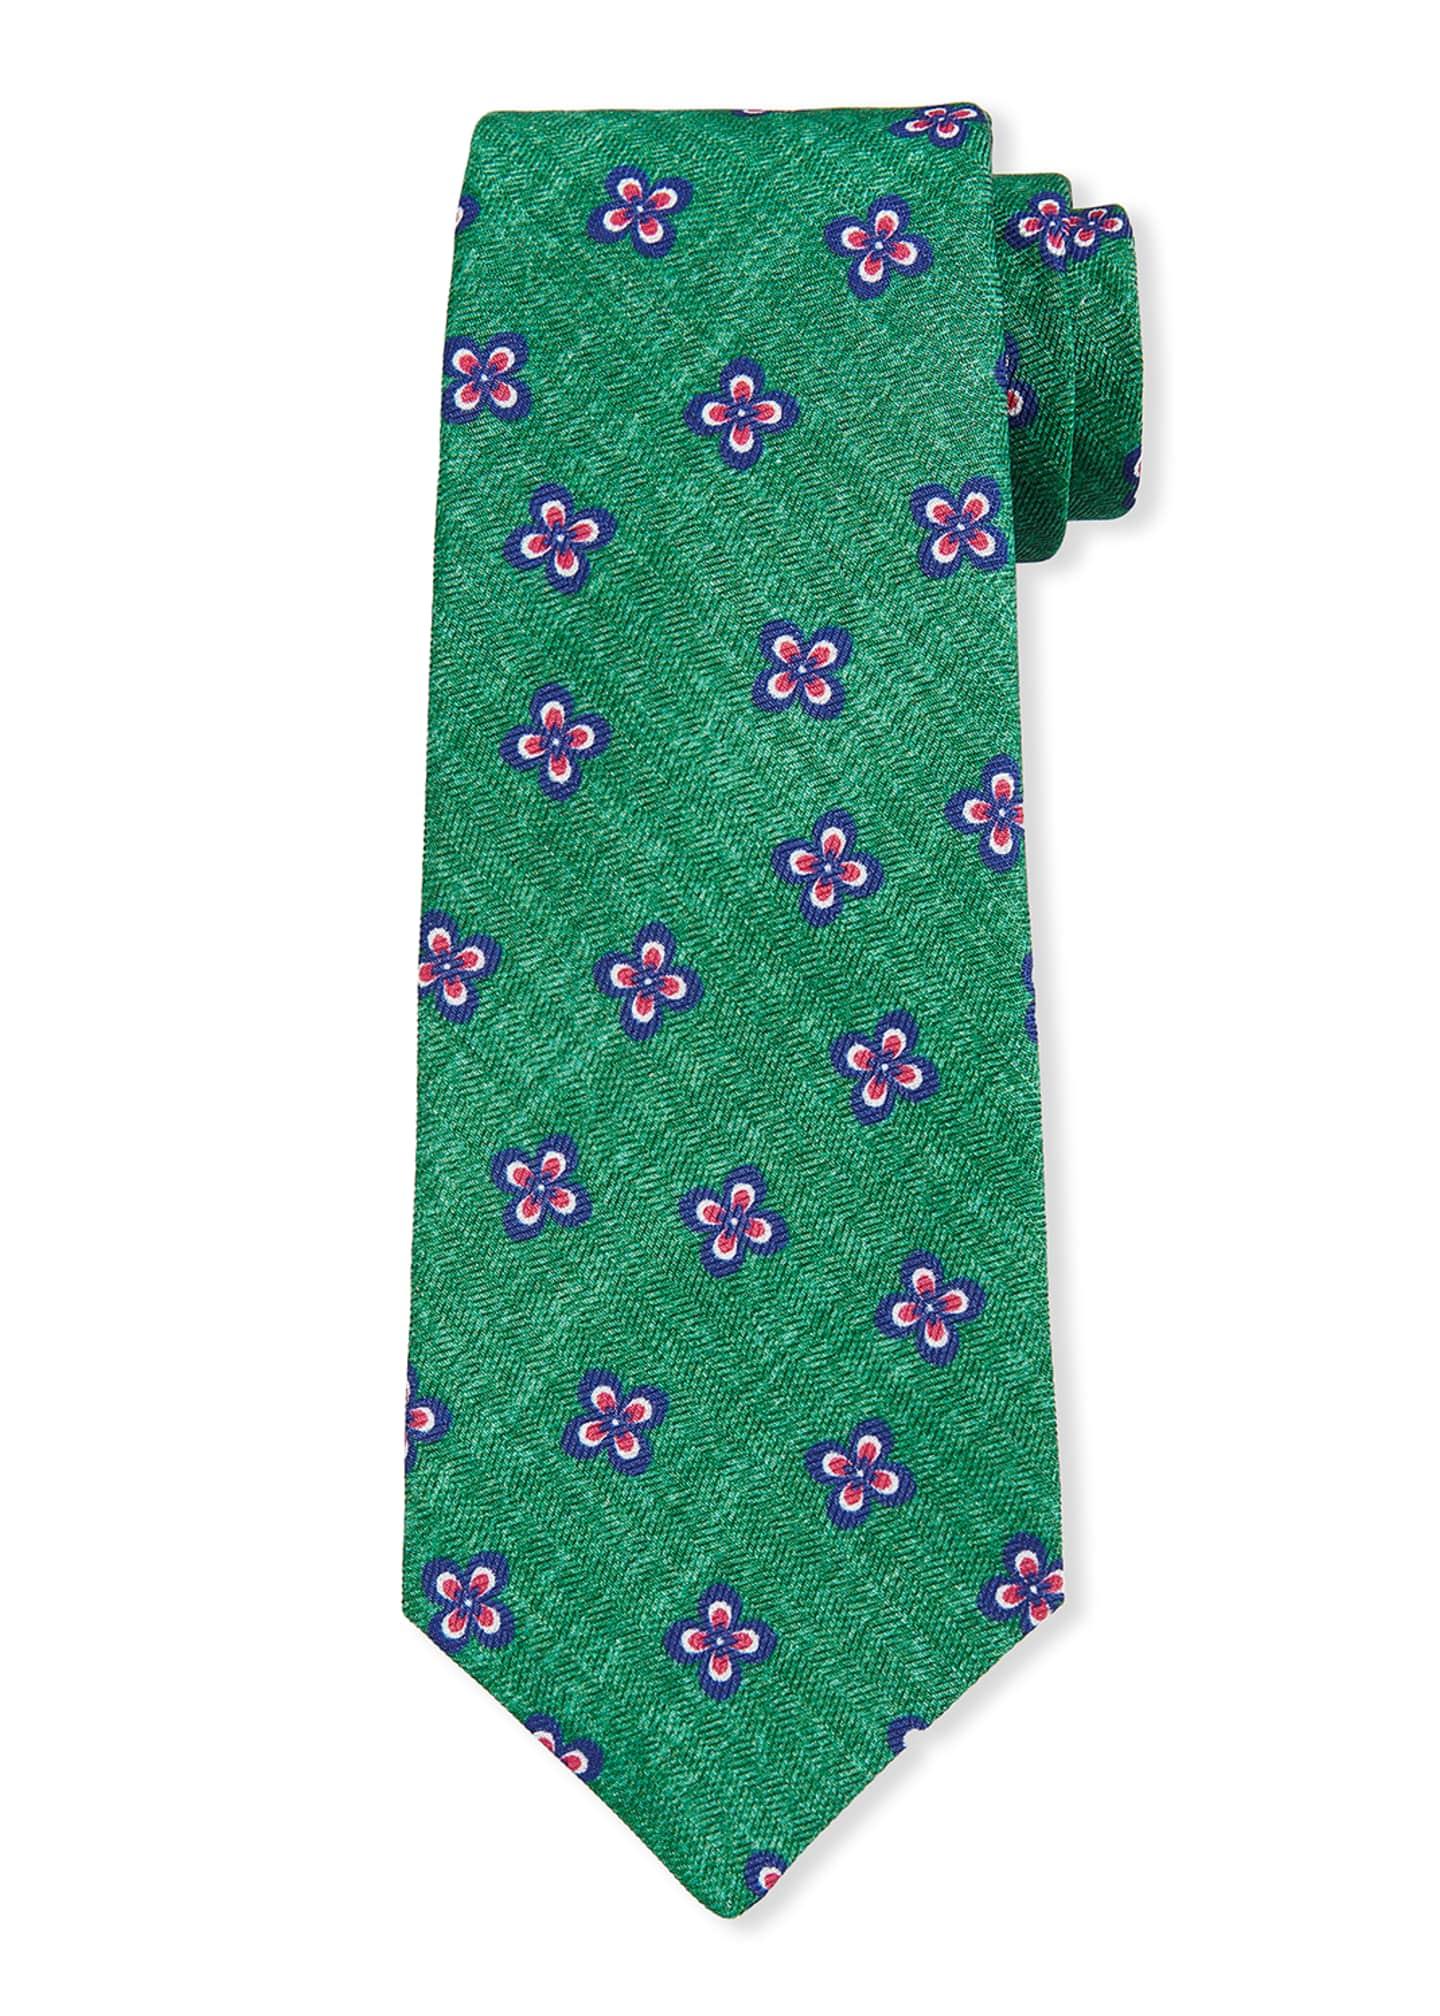 Kiton Men's Four Petal Flower Silk Tie